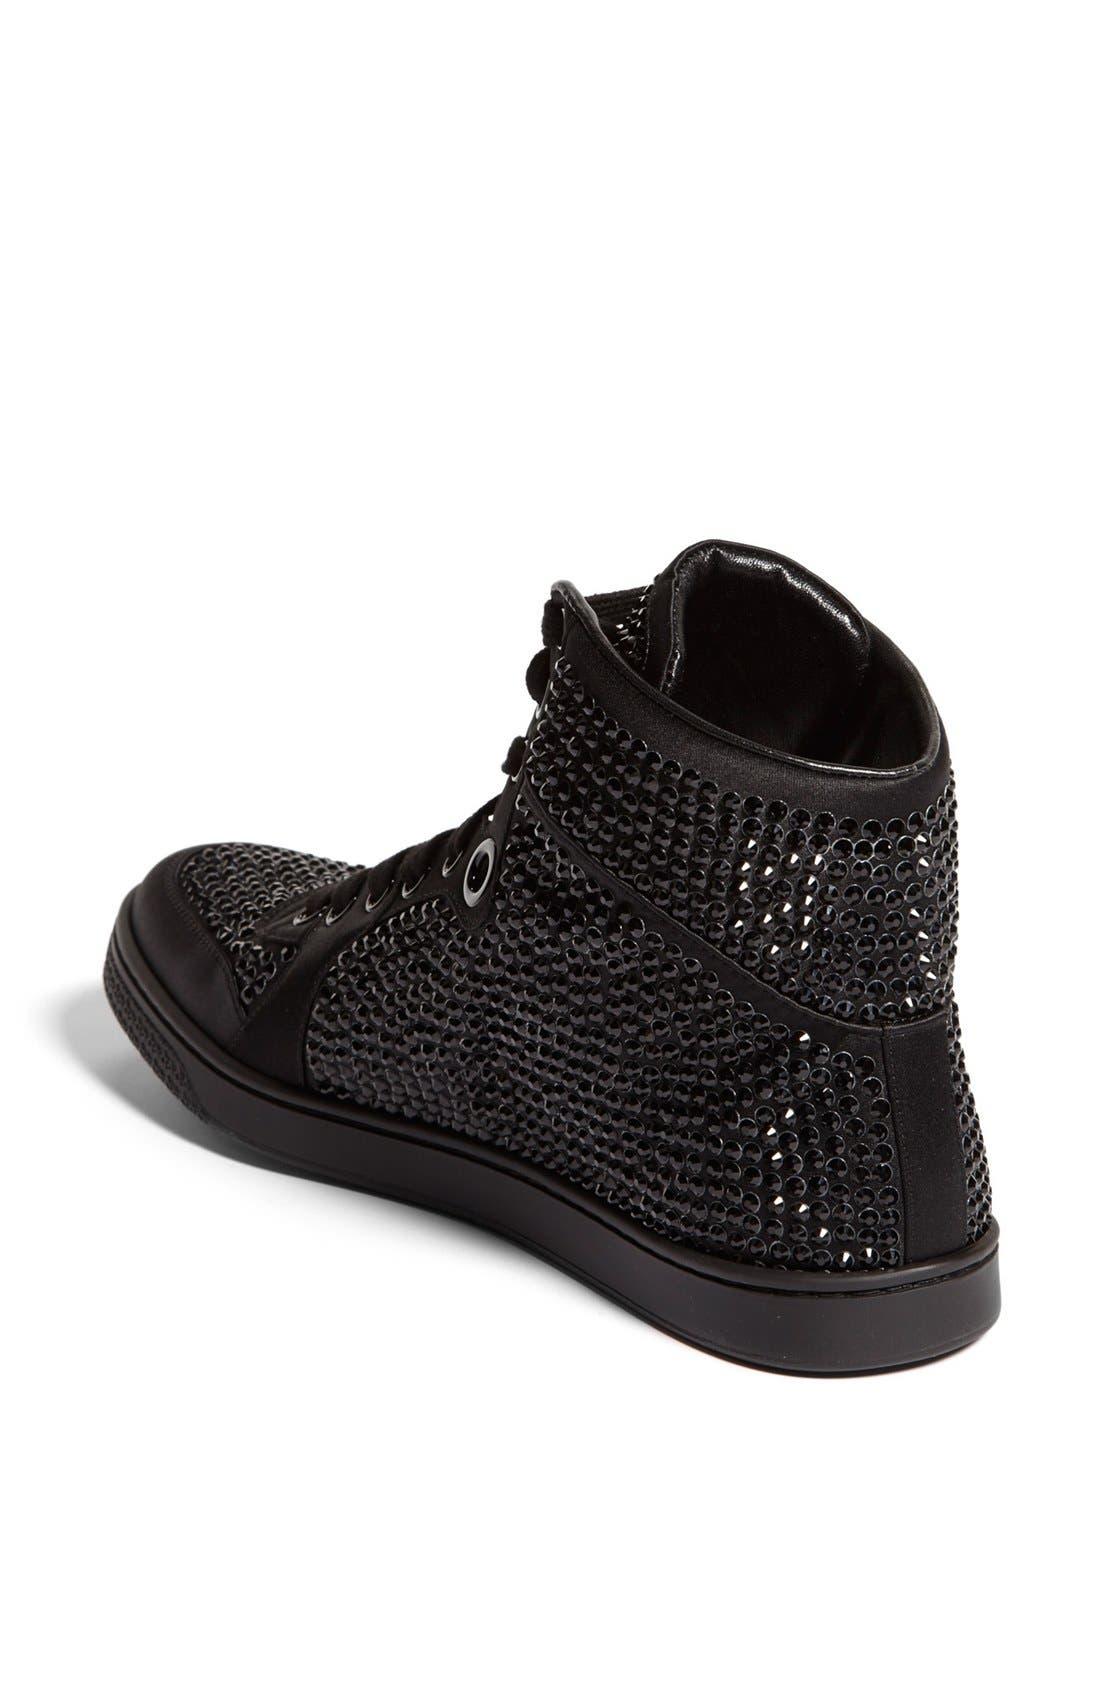 Alternate Image 2  - Gucci 'Coda' Crystal Stud High Top Sneaker